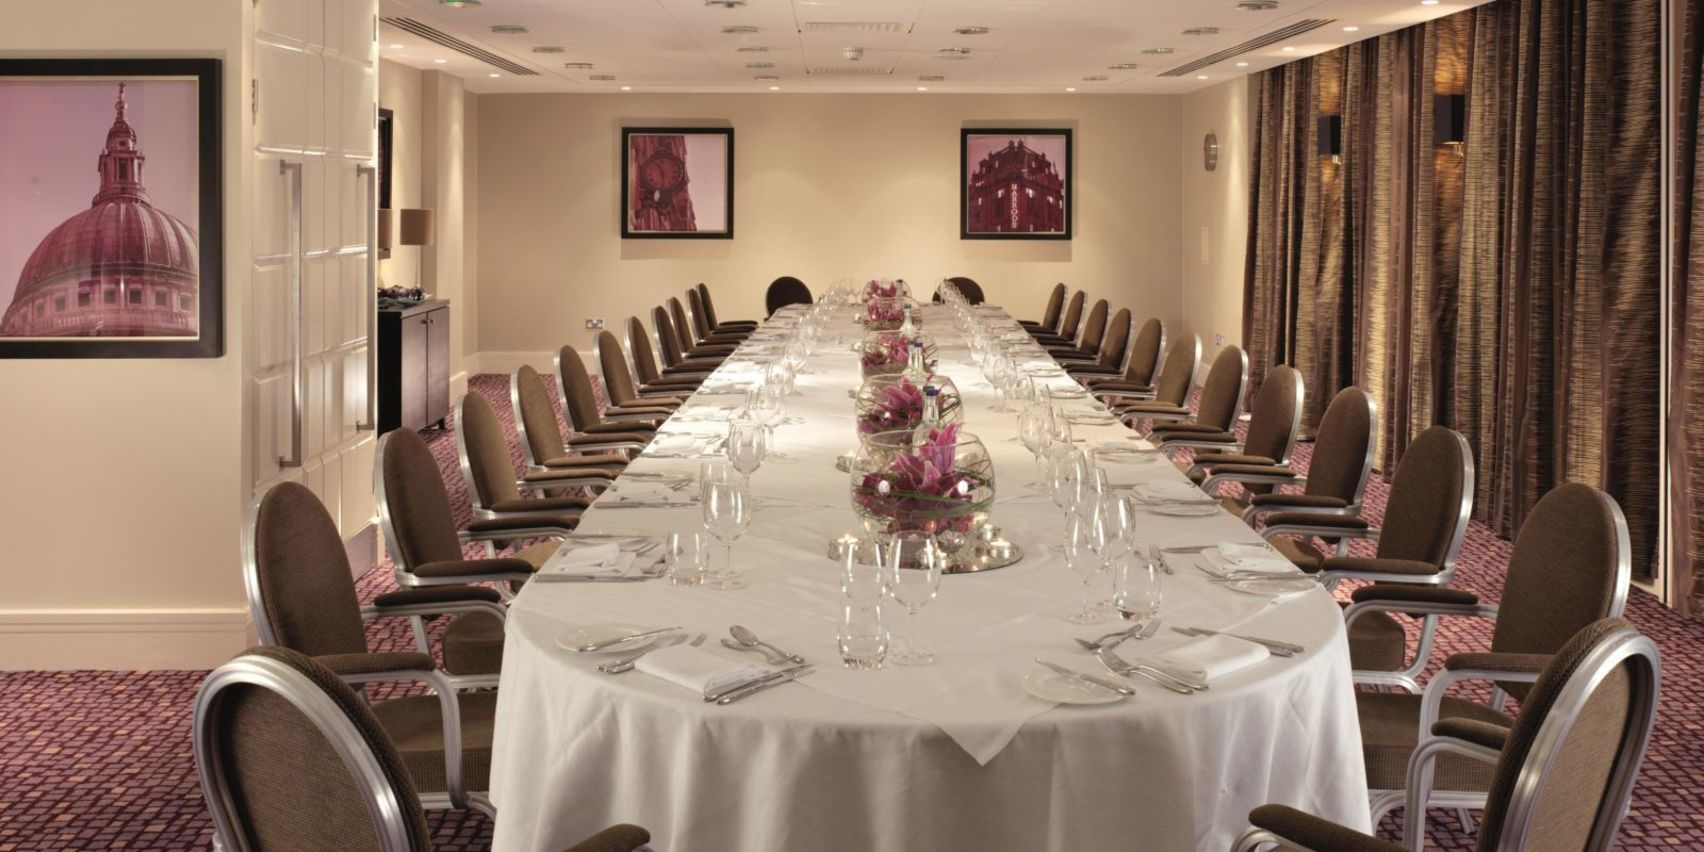 Knightsbridge Room, Crowne Plaza London Ealing